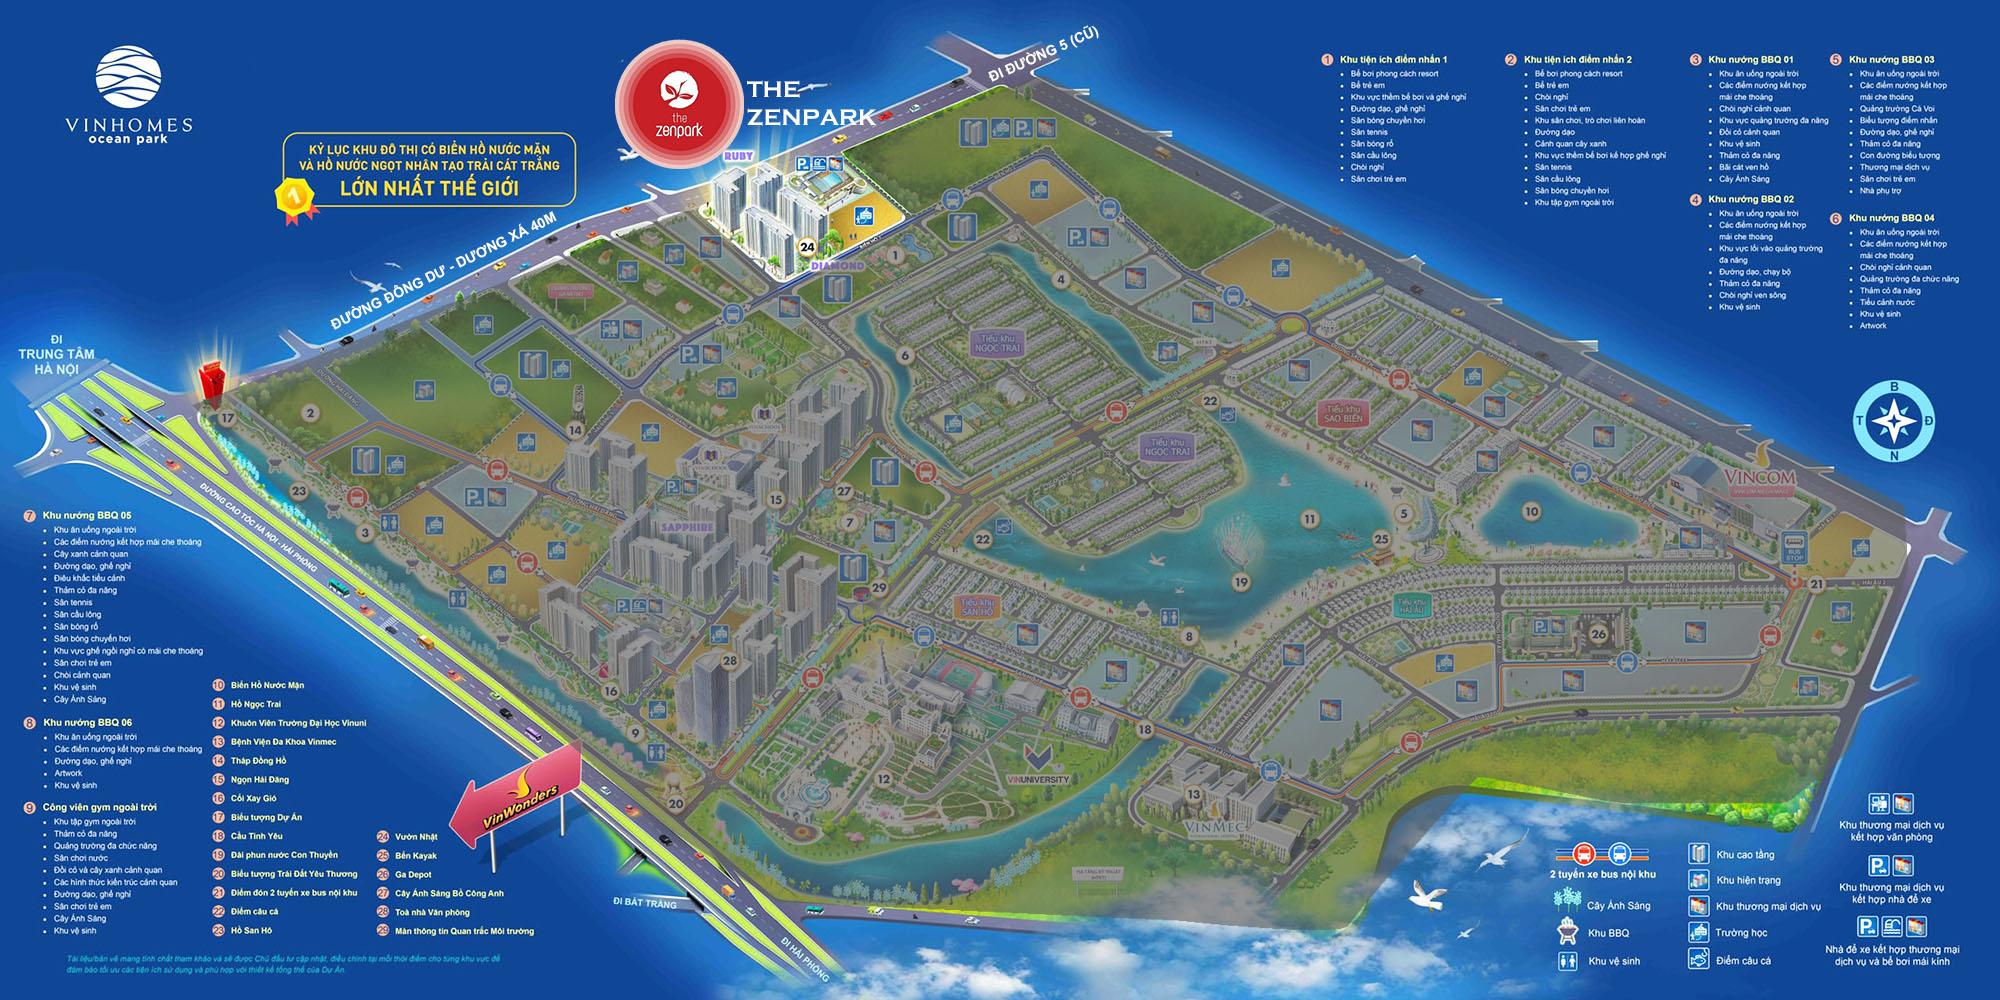 vị trí phân khu the zenpark vinhomes ocean park